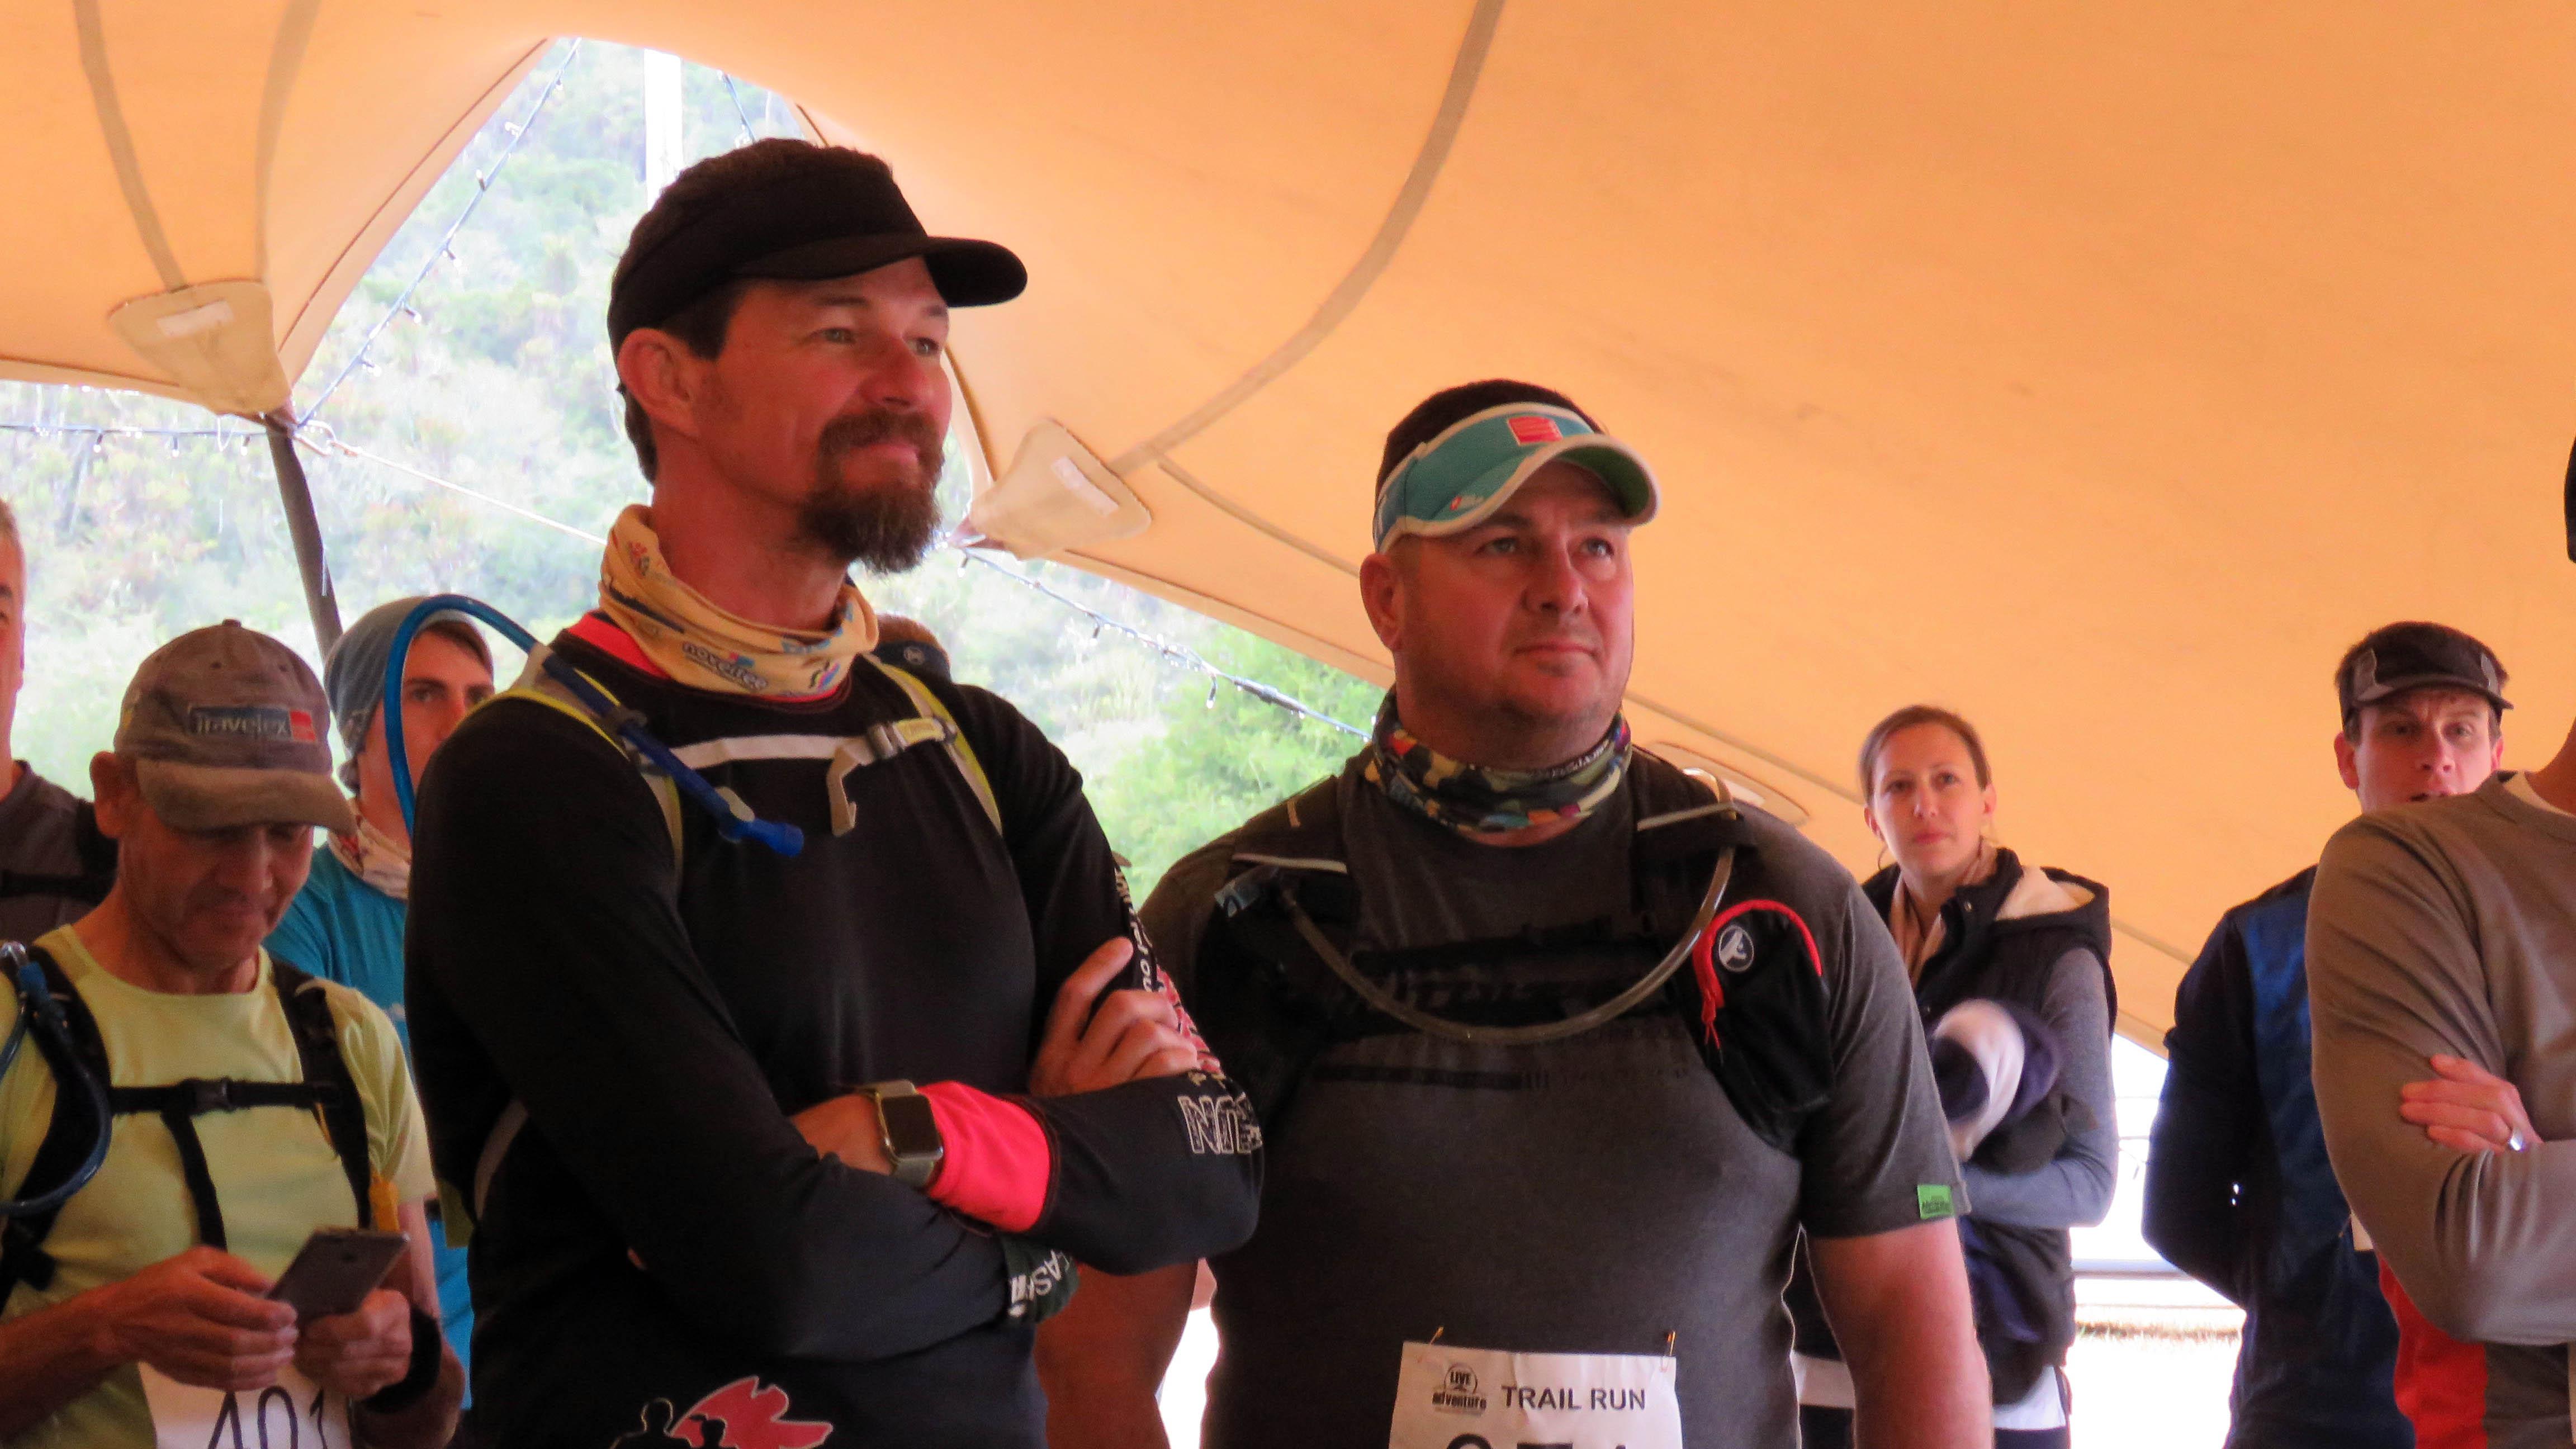 hayterdale trailrun 2018-08-05  (12)